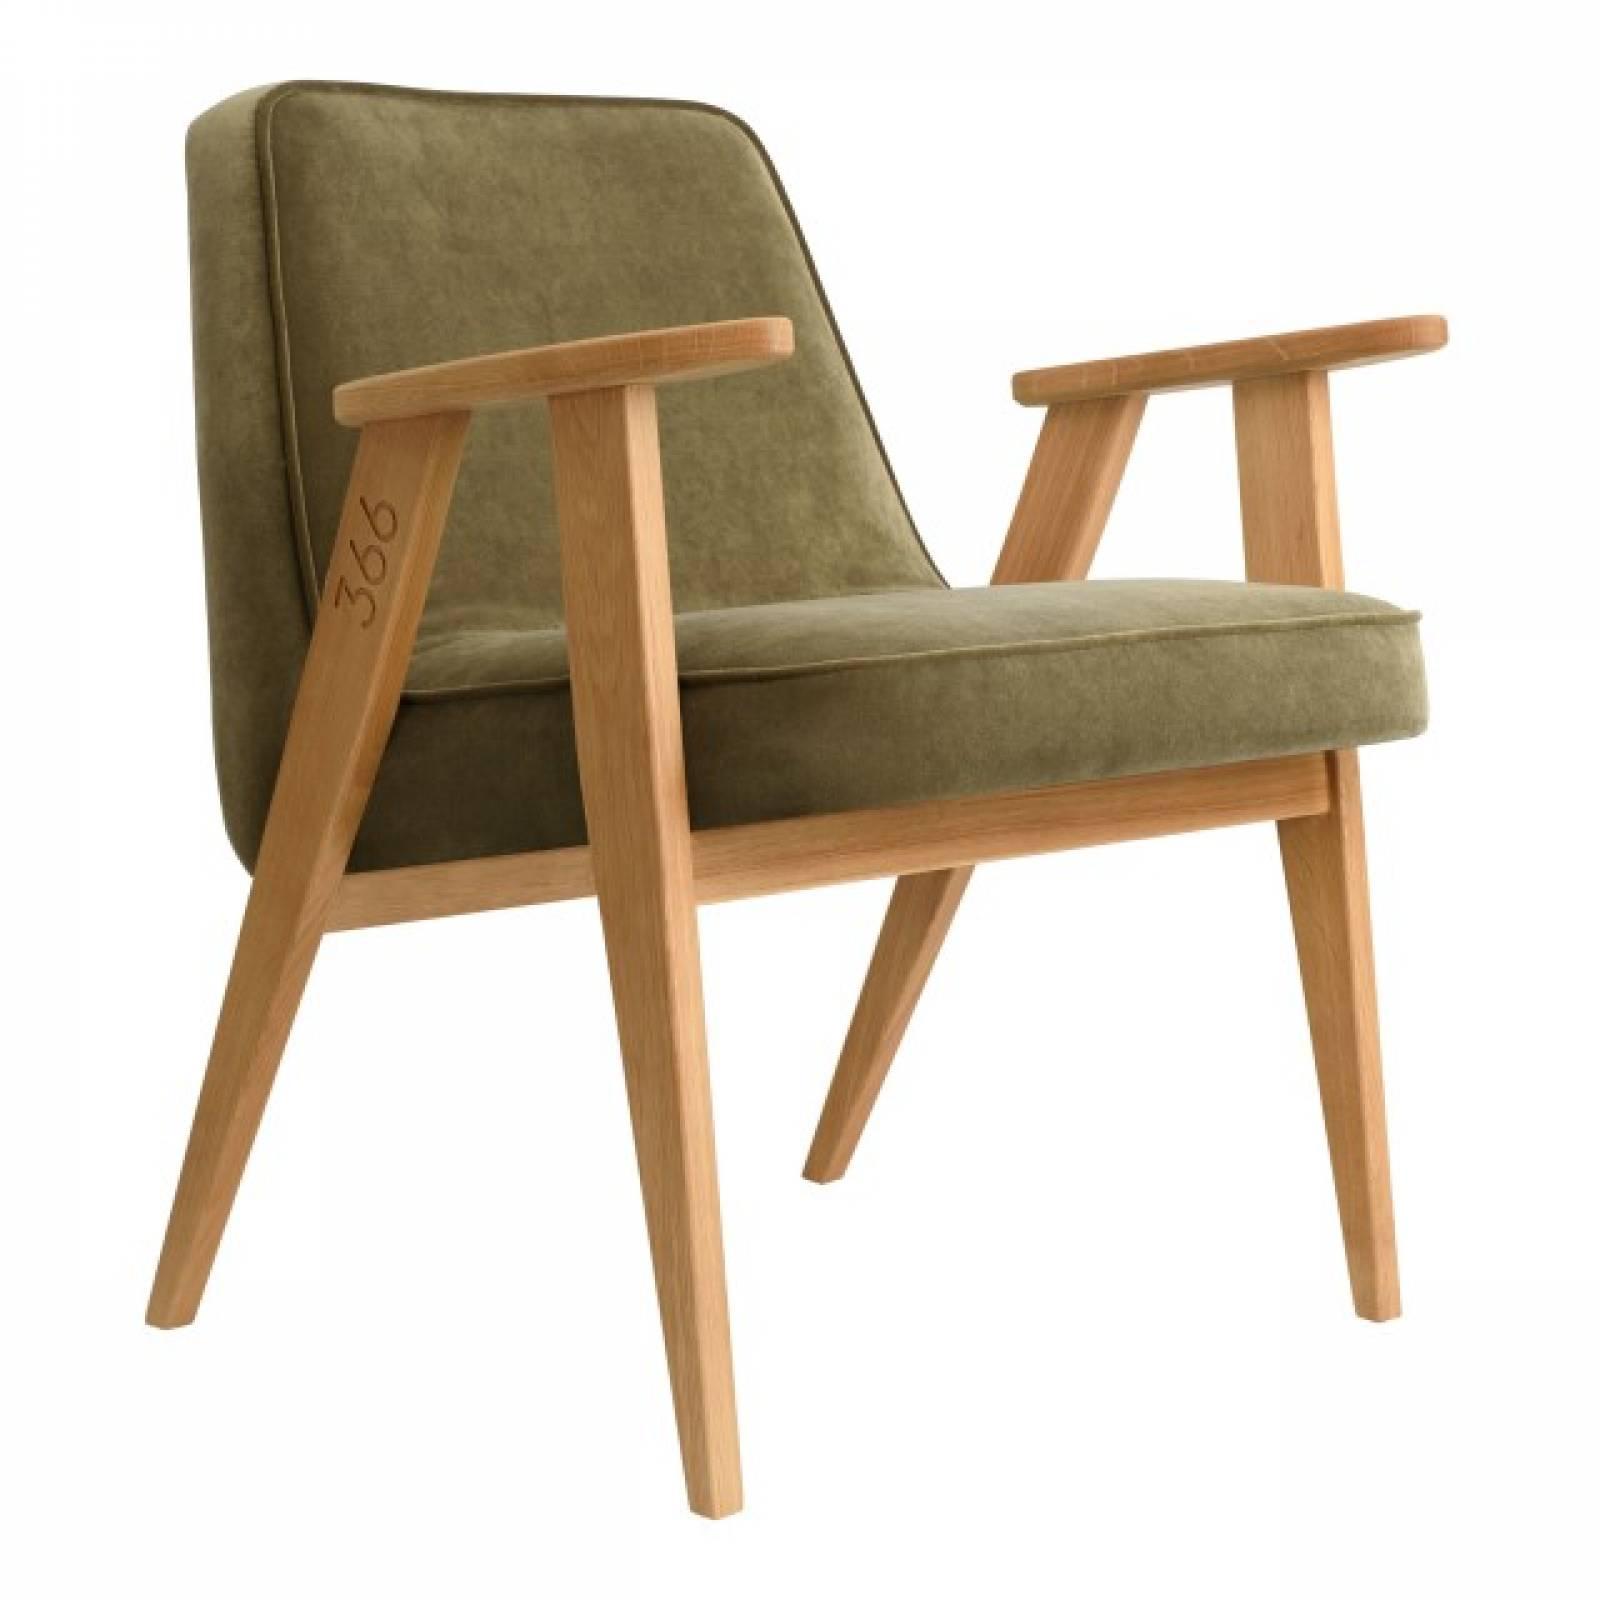 366 Armchair - Velvet Fabrics thumbnails